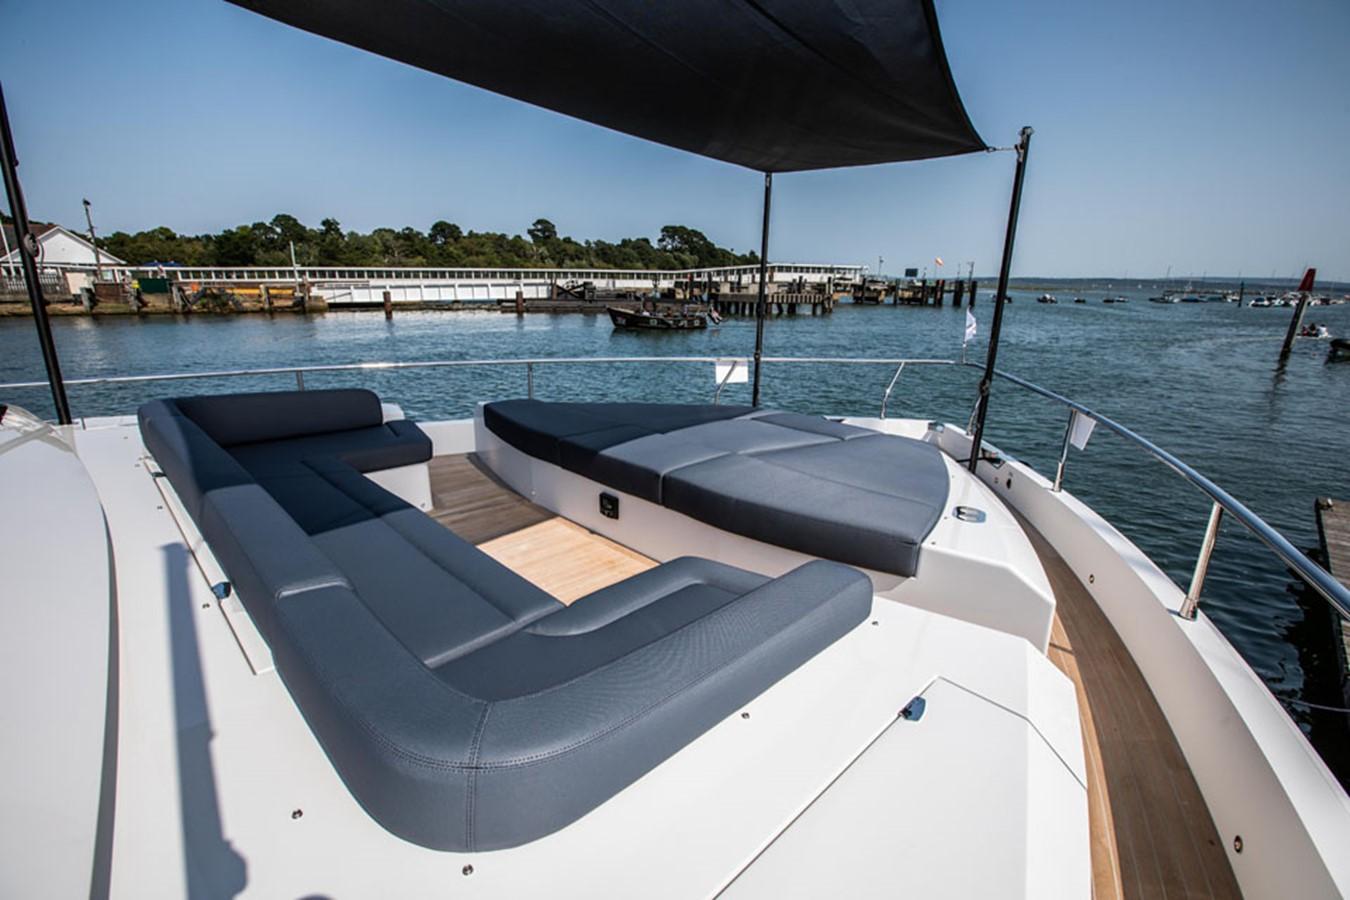 2019 PEARL MOTOR YACHTS Pearl 80 Motor Yacht 2615324